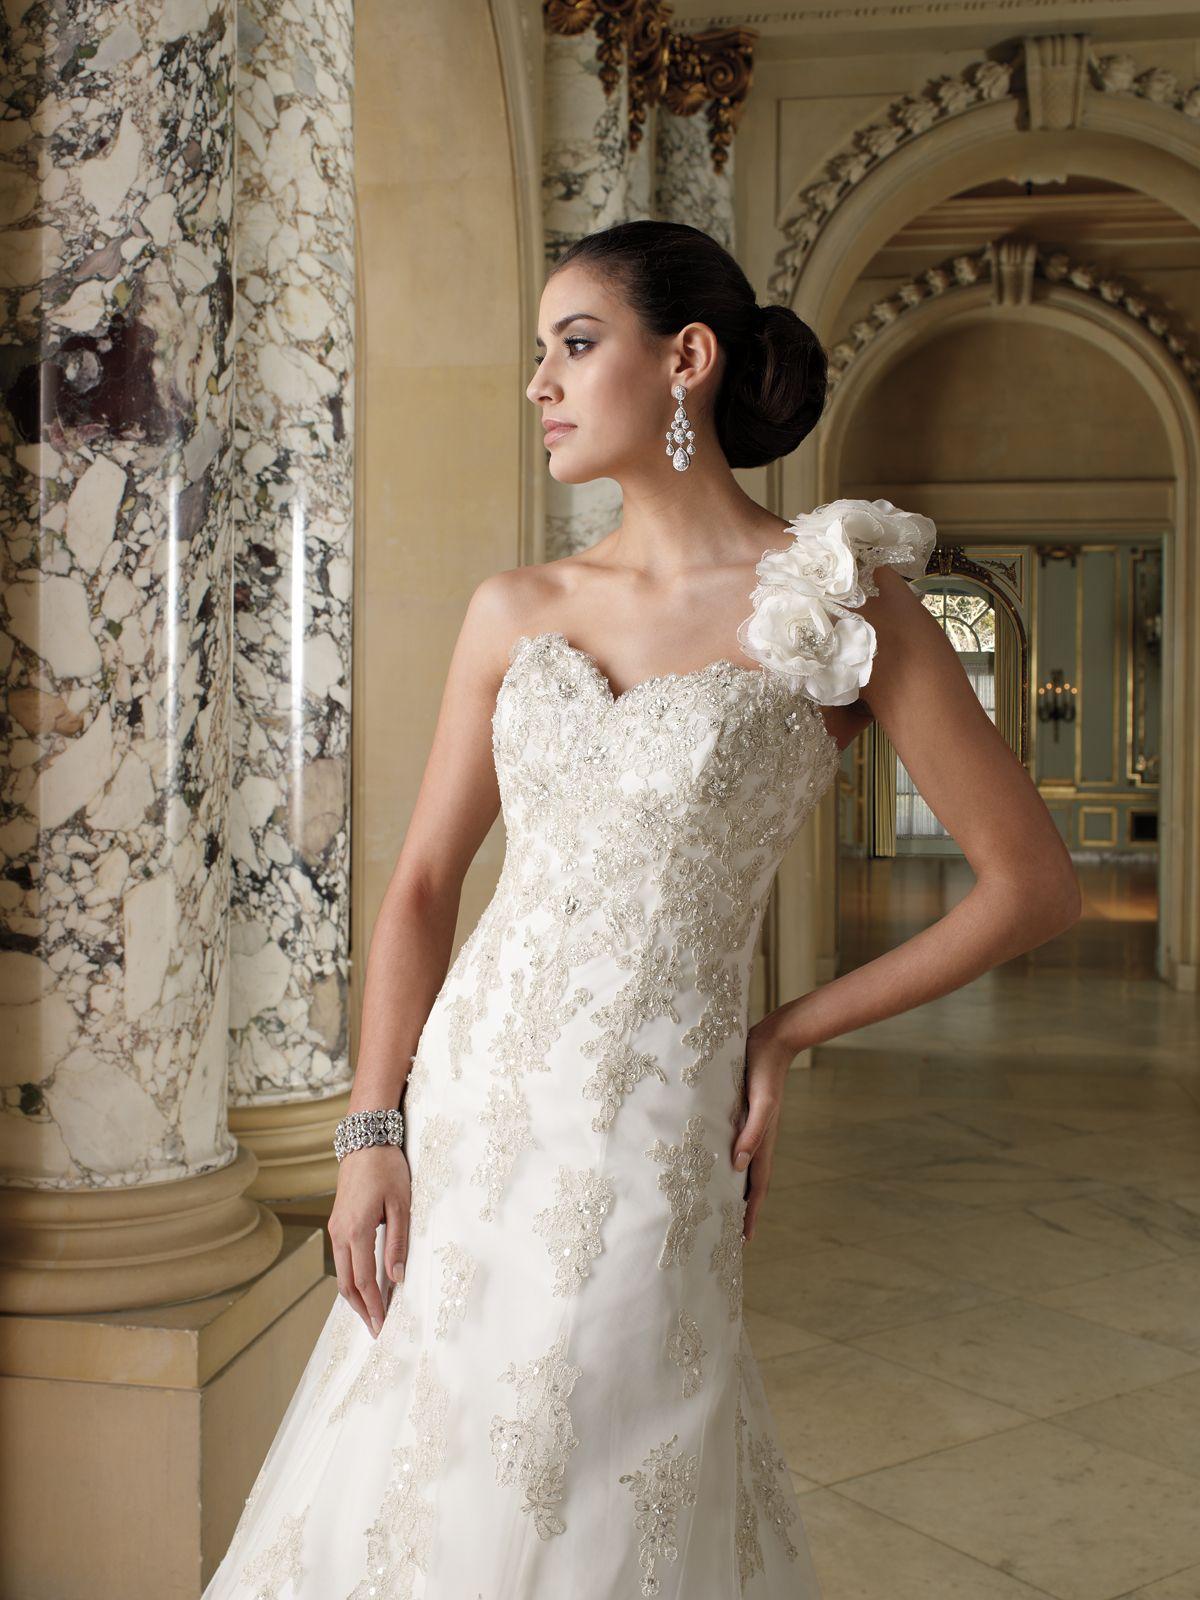 Oneshoulder lace and tulle aline gown detachable single shoulder